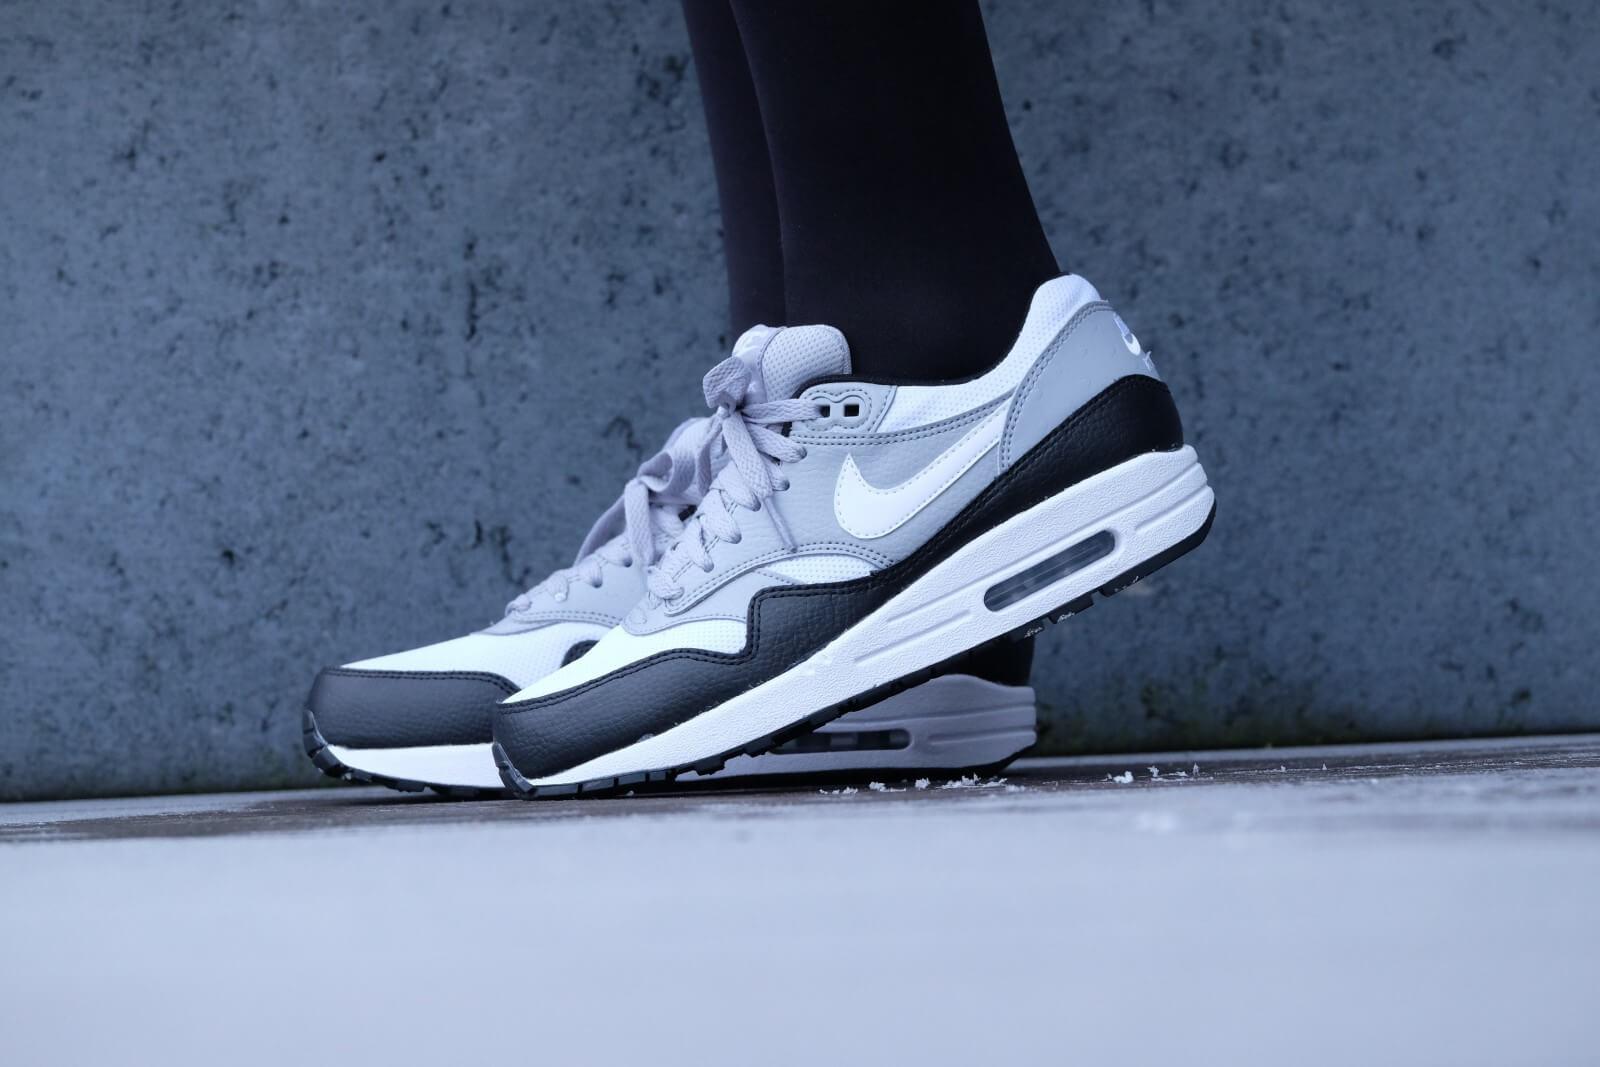 Nike Air Max 1 White Black Wolf Grey leoncamier.co.uk da3ff650f9